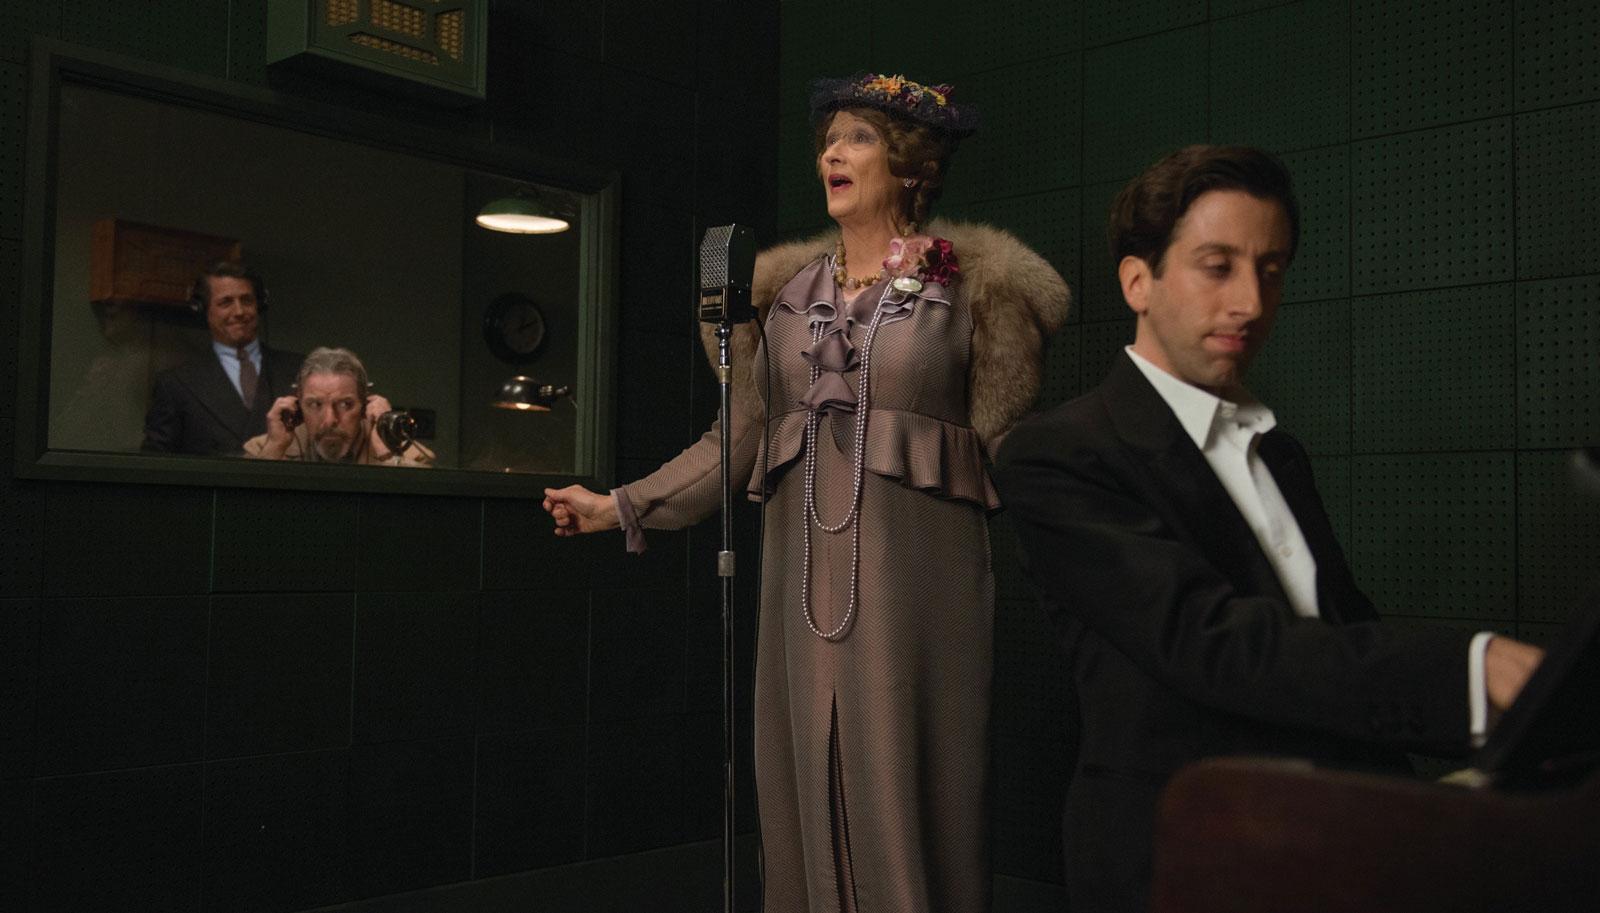 Hugh Grant, Lloyd Hutchinson, Meryl Streep, and Simon Helberg in Stephen Frears's <em>Florence Foster Jenkins</em>, 2016